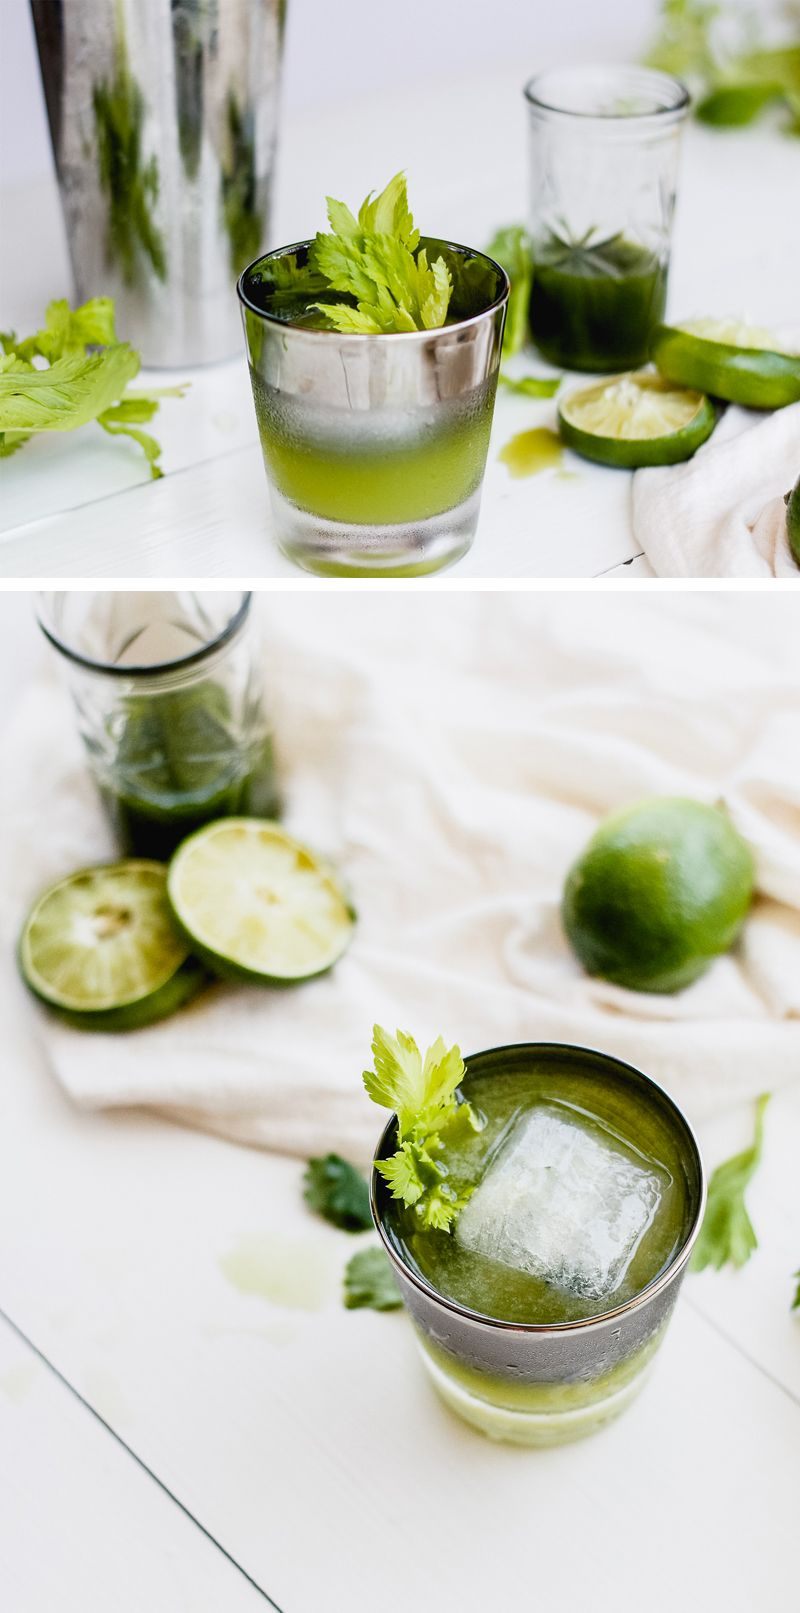 Celery & Cilantro Sipper Cocktail Recipe | Celery, Vodka and Cocktail